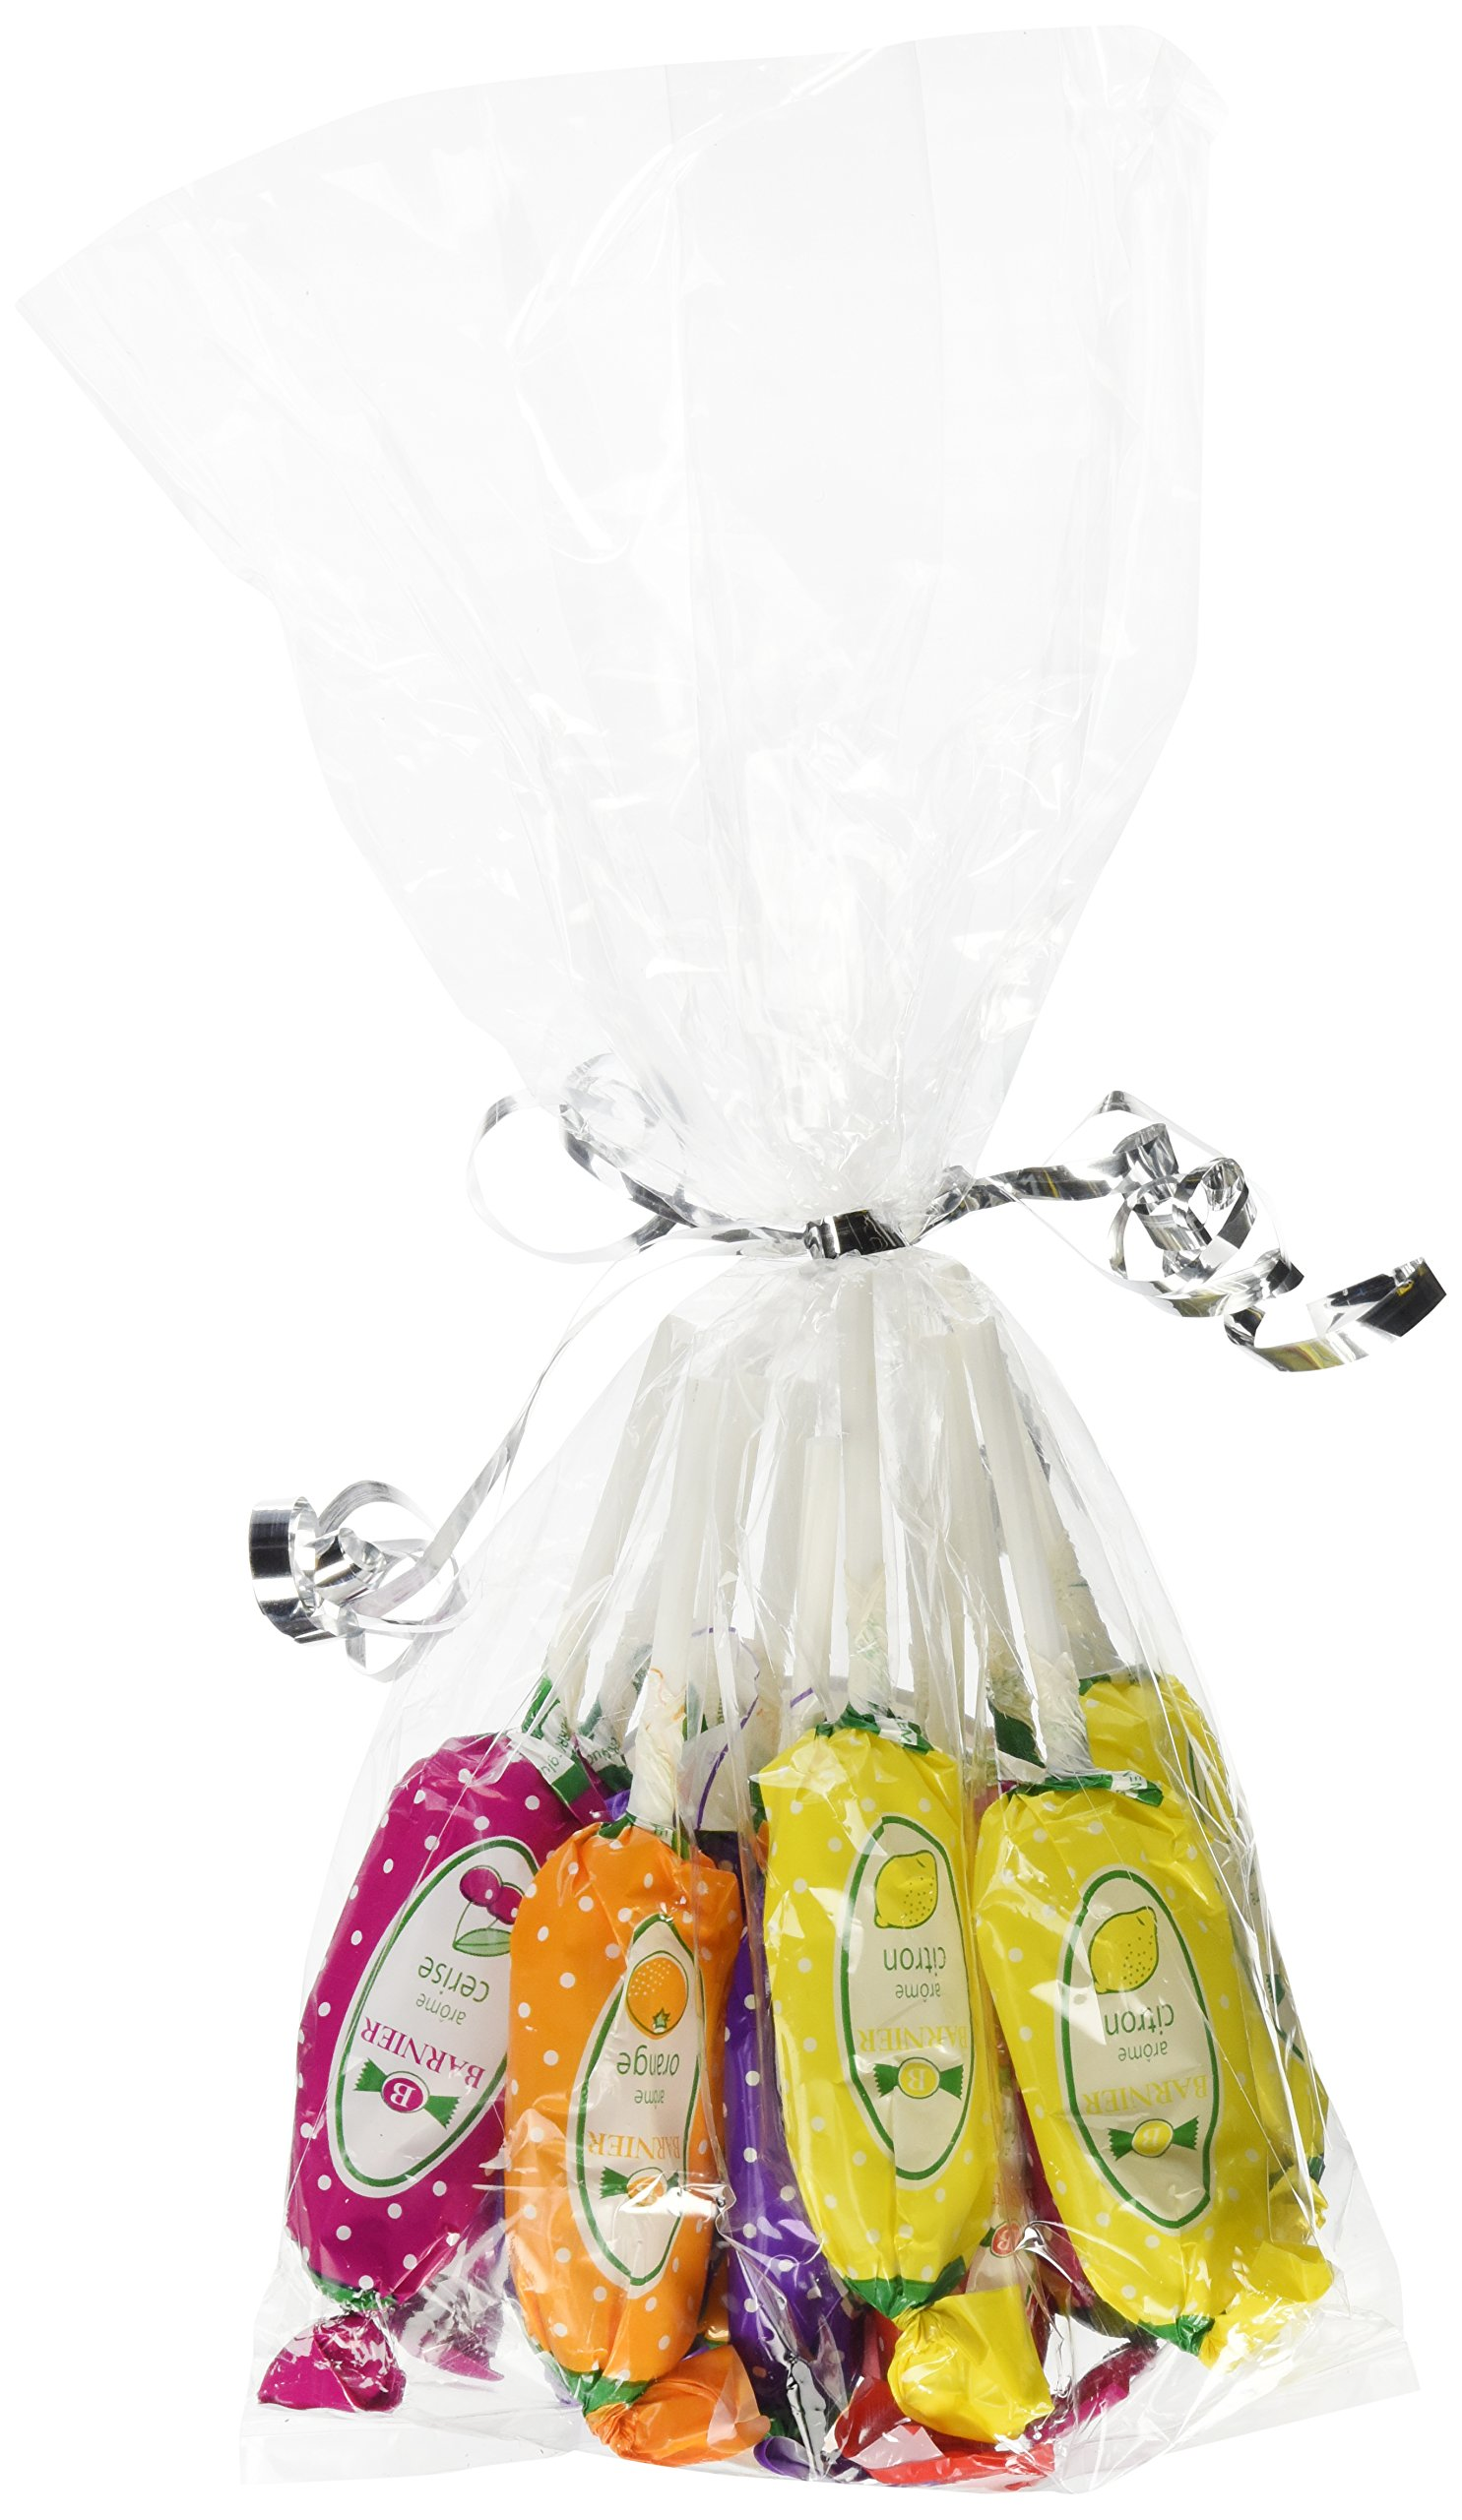 Bonbons Barnier 12 Assorted Lollipops in Gift Bag